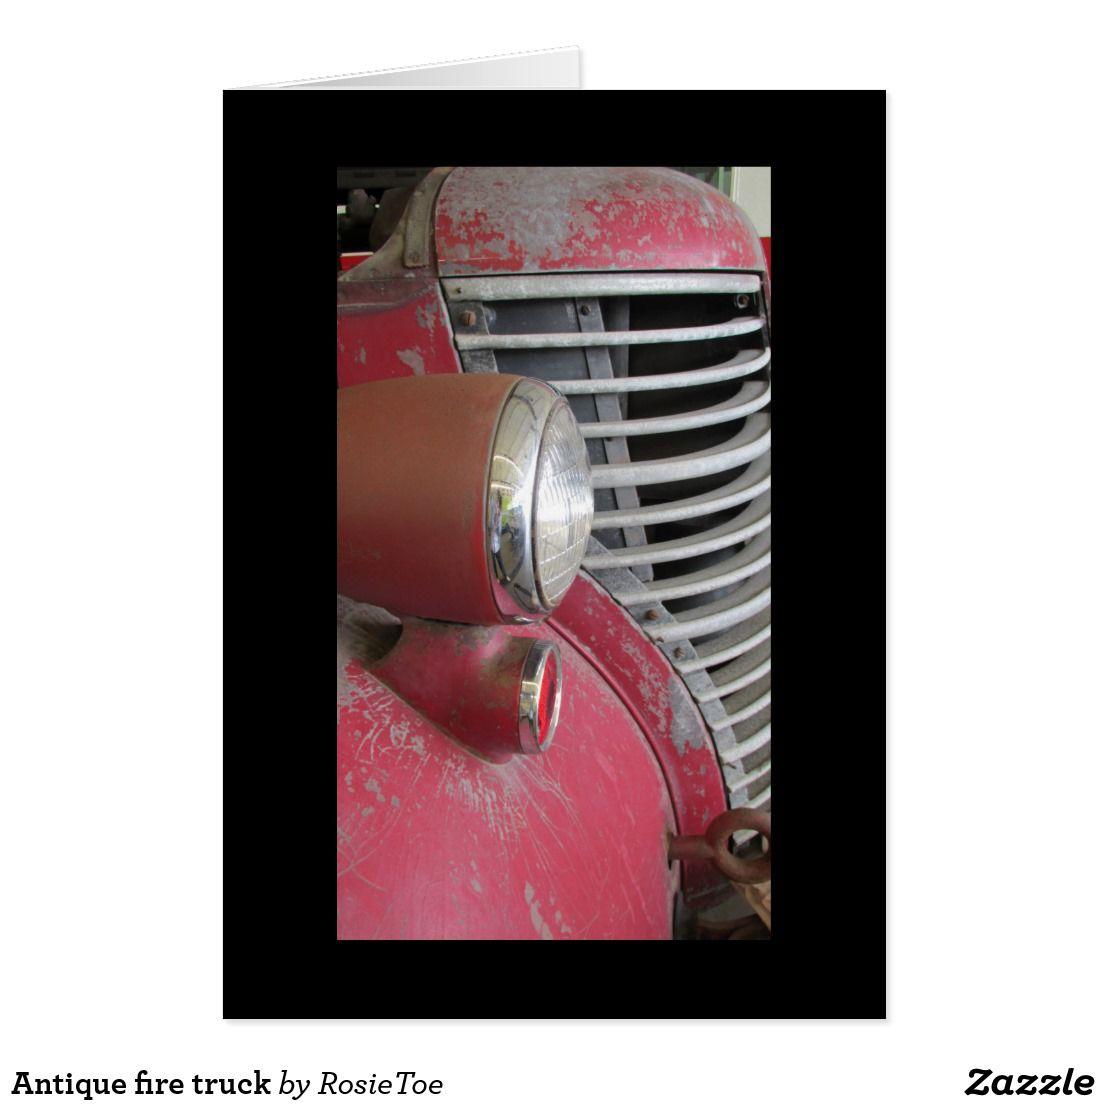 Antique fire truck fire trucks antiques design